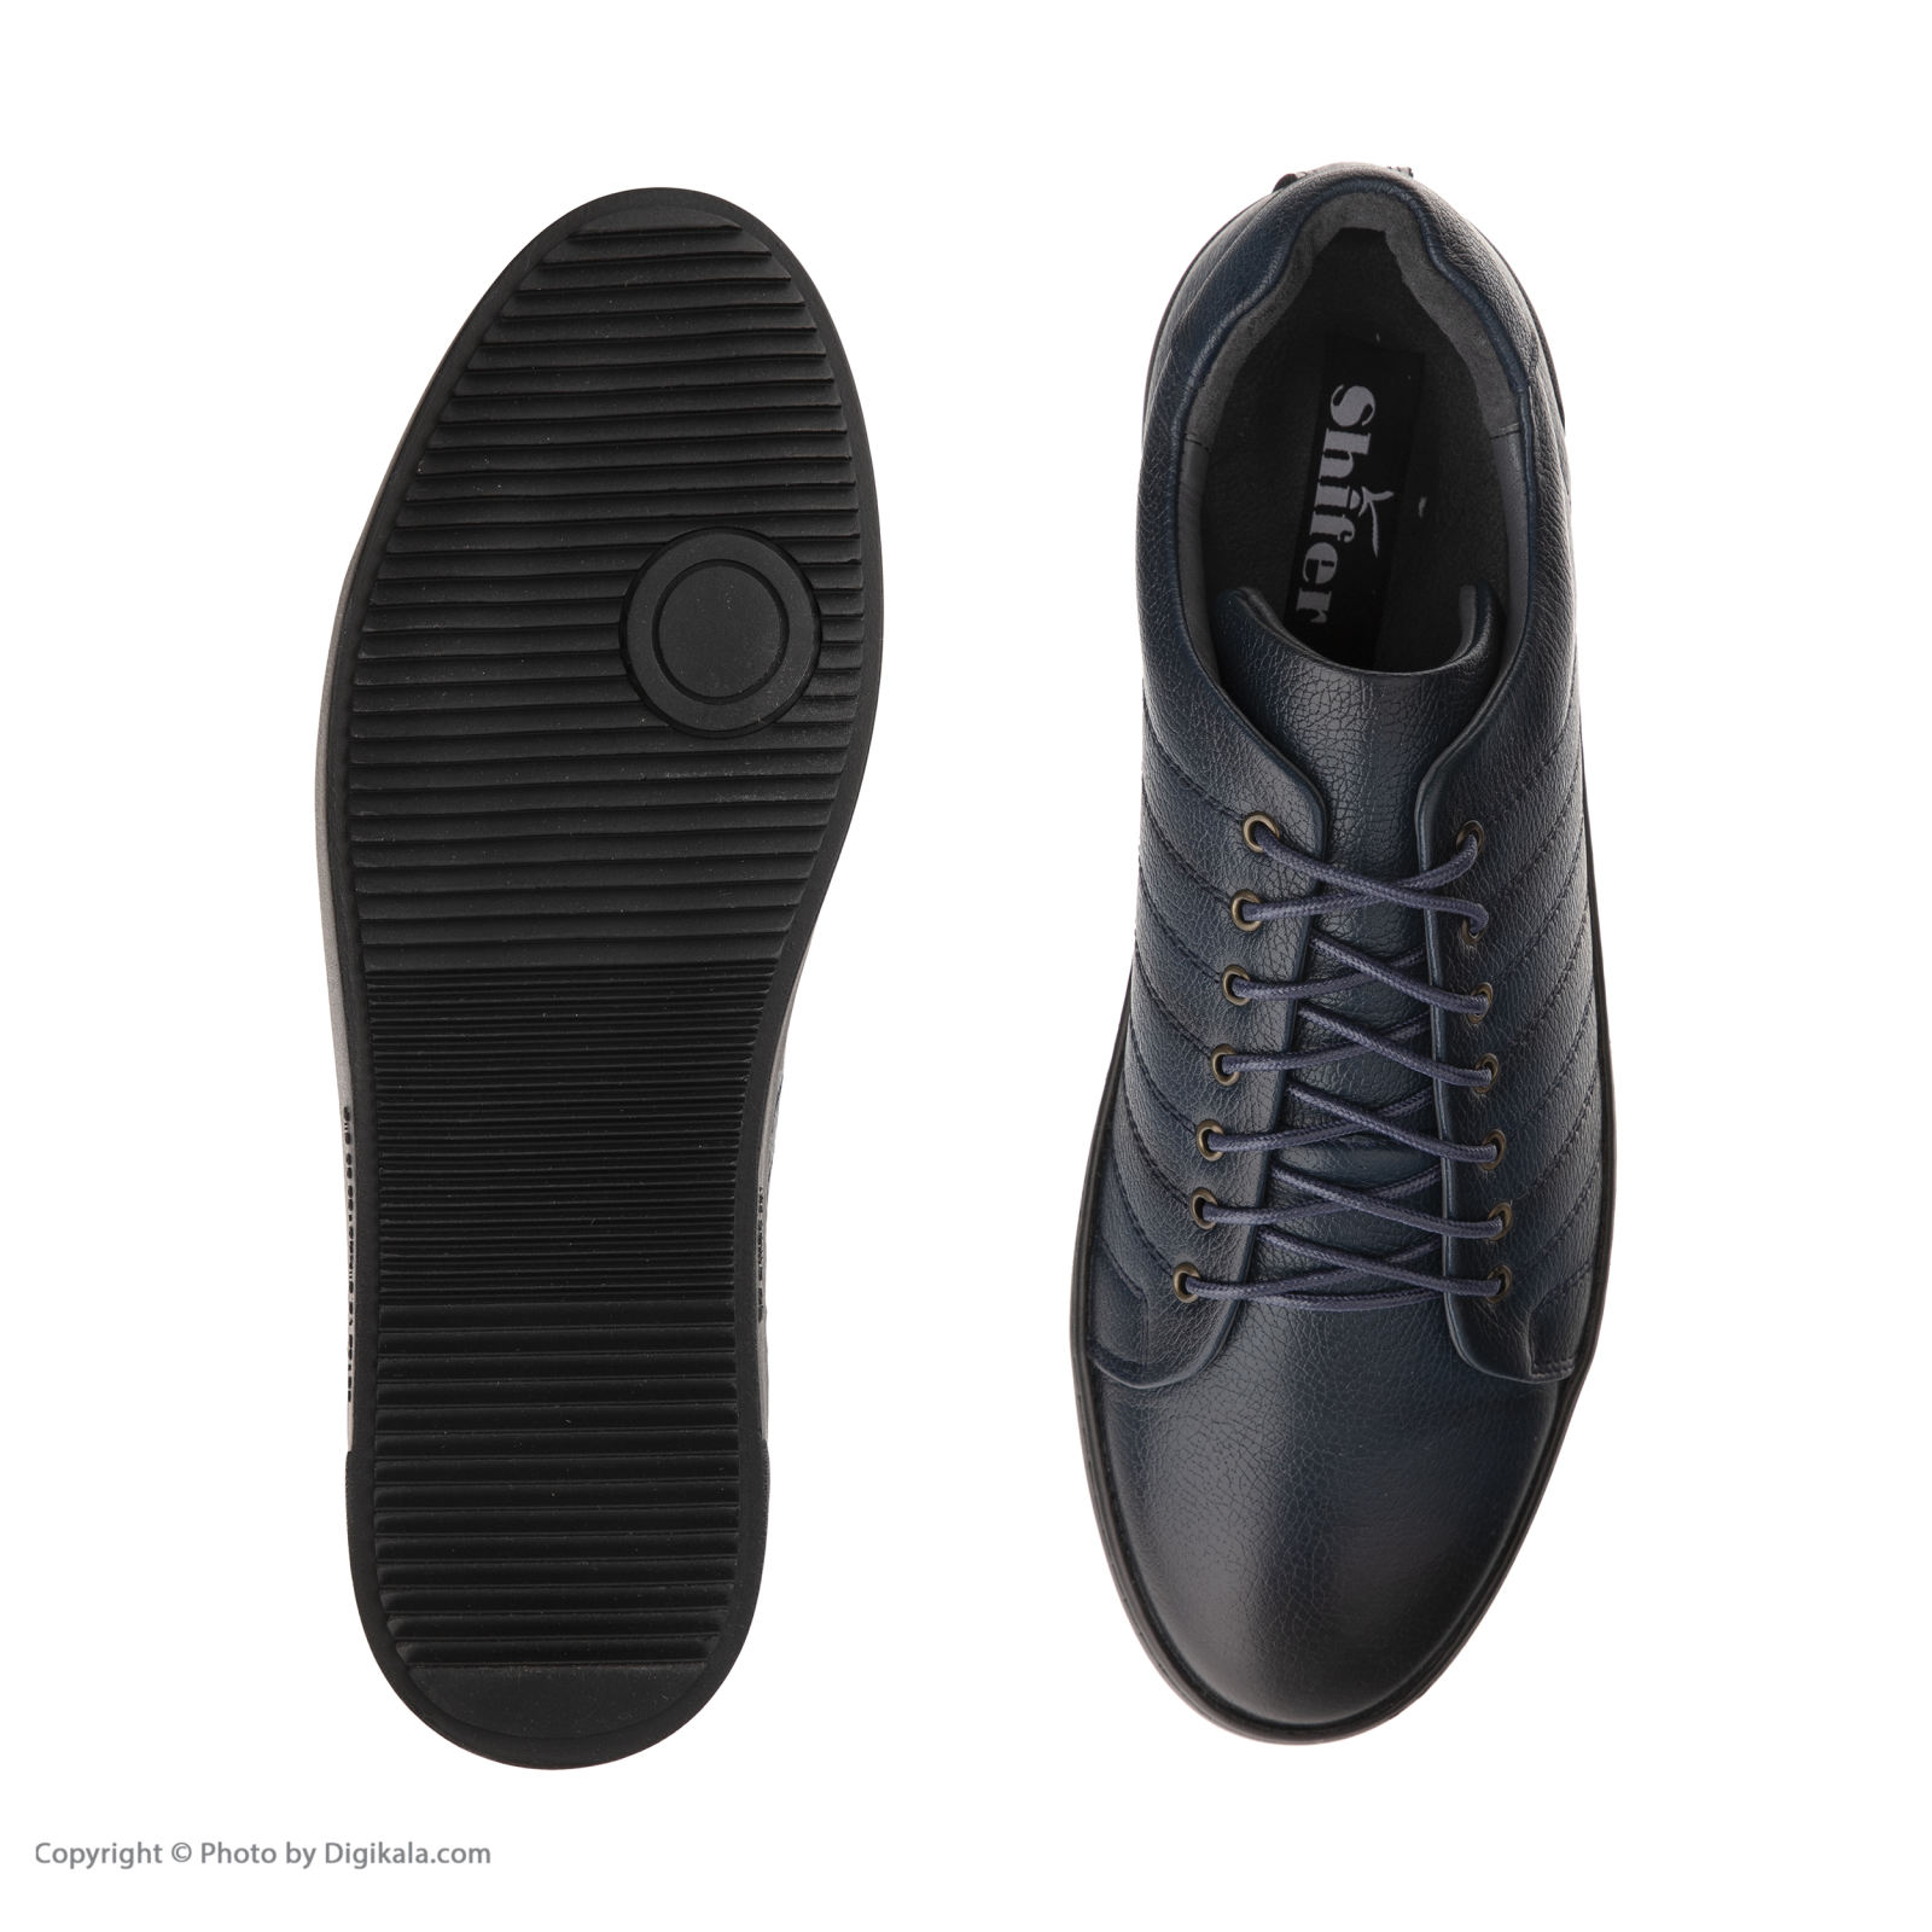 کفش روزمره مردانه شیفر مدل 7359A503103 -  - 7